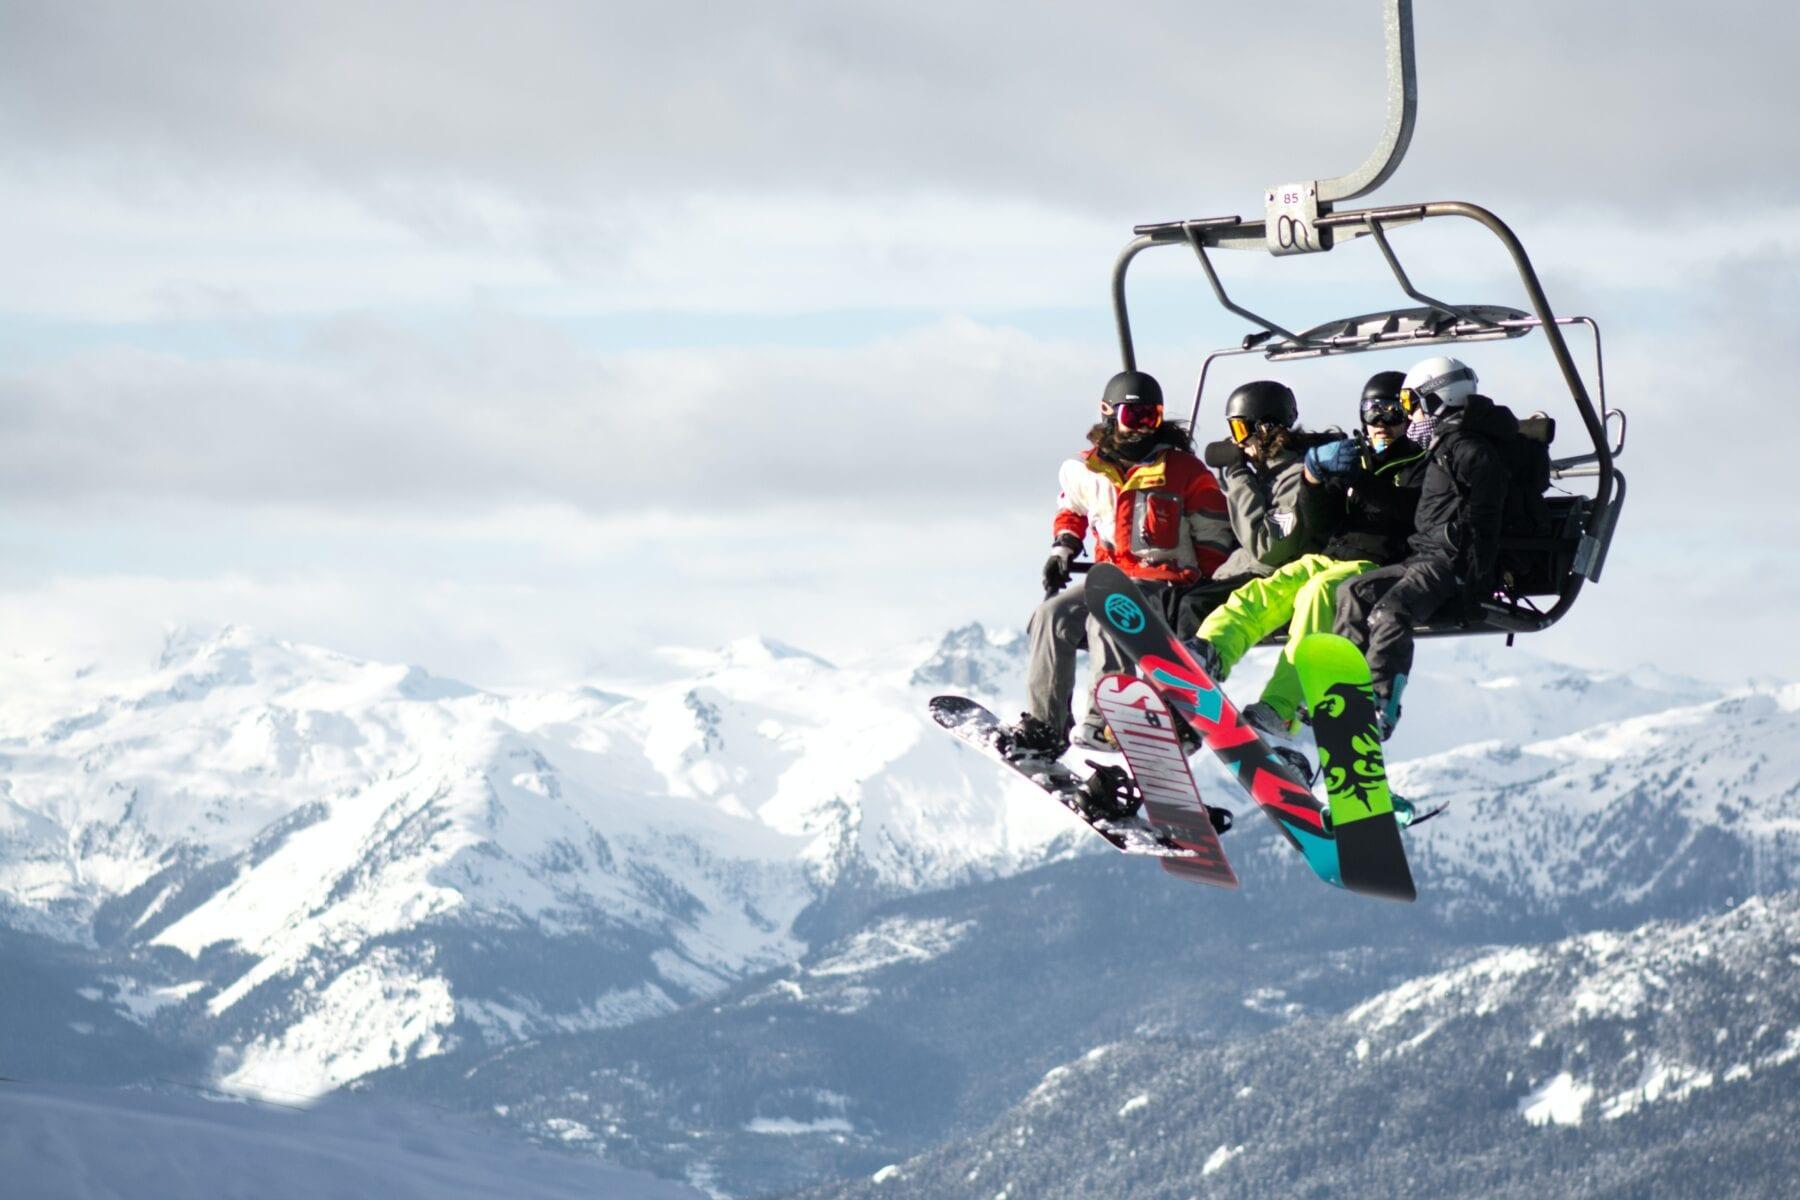 Salomon ode aan stoeltjeslift snowboarder